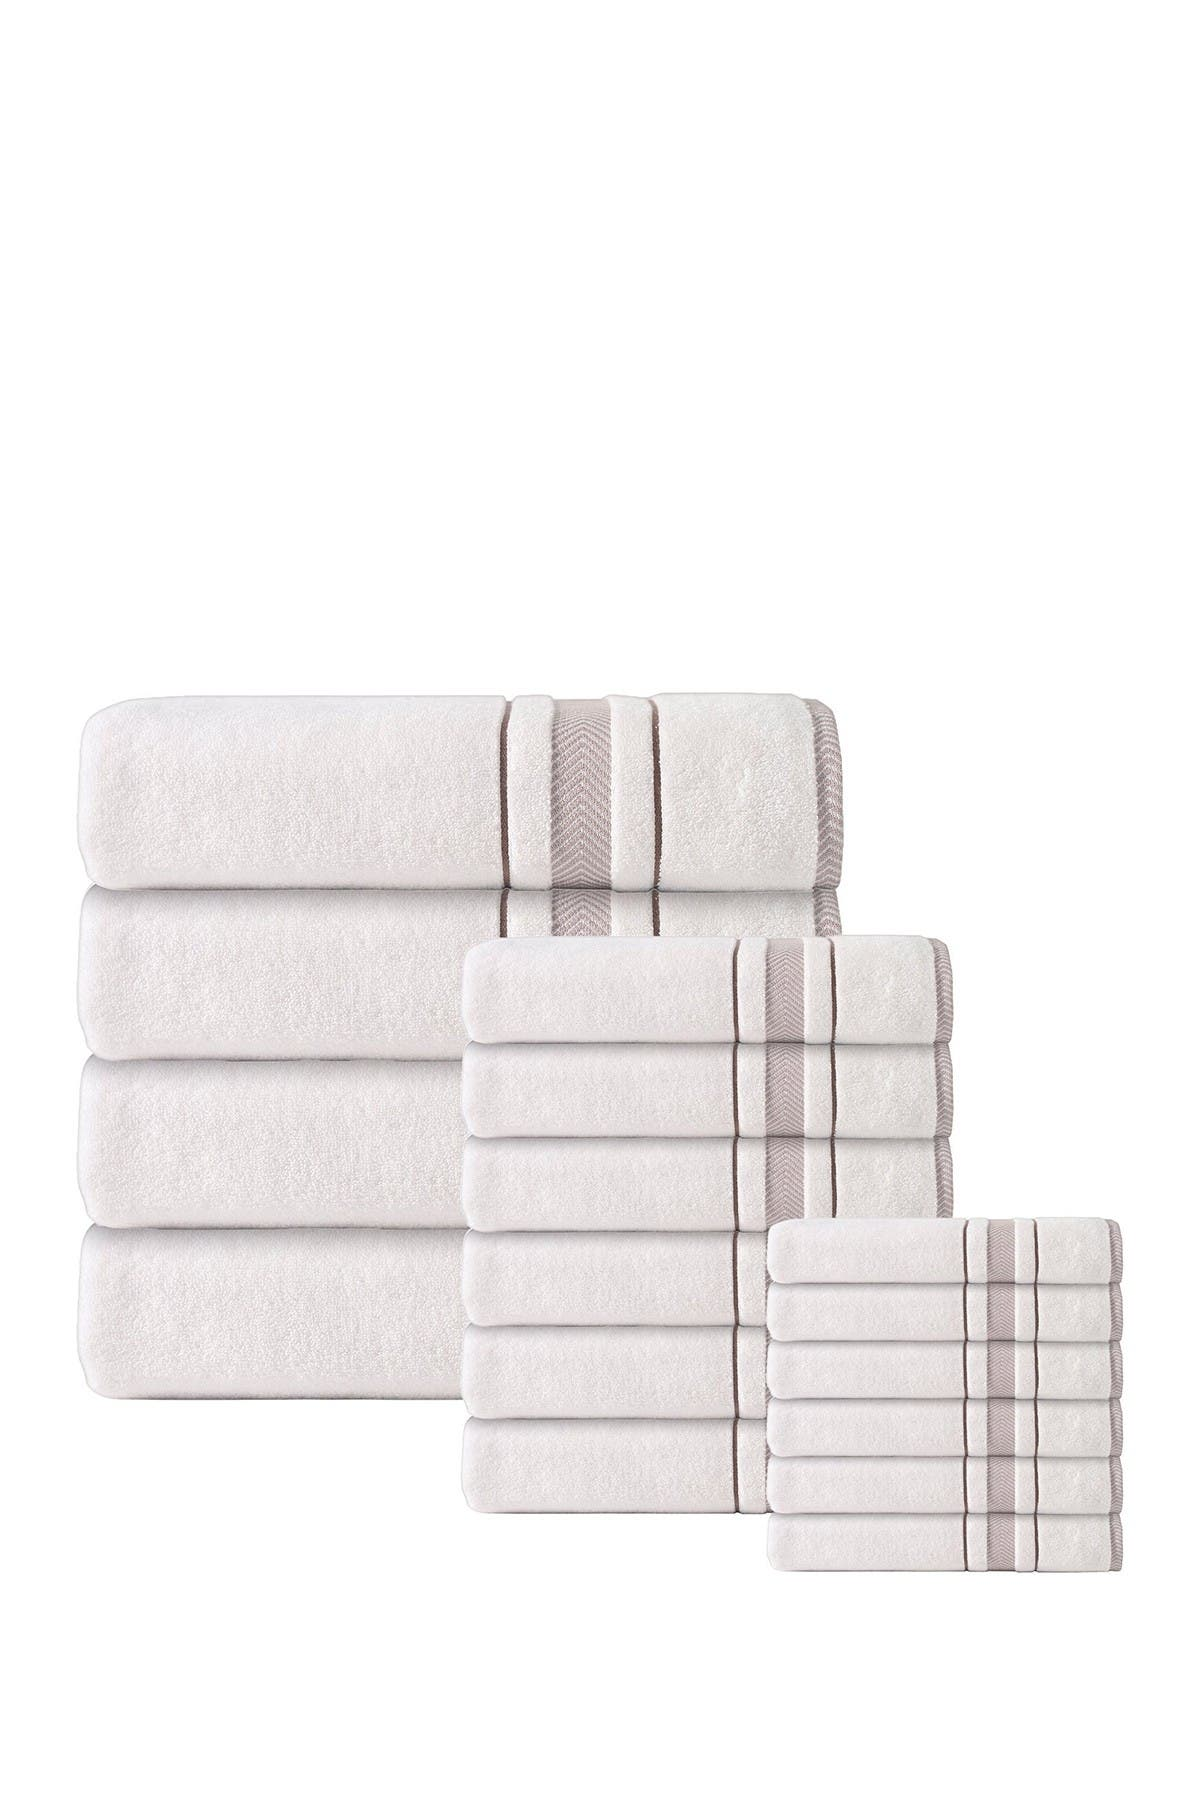 Image of ENCHANTE HOME Enchasoft Turkish Cotton 16-Piece Towel Set